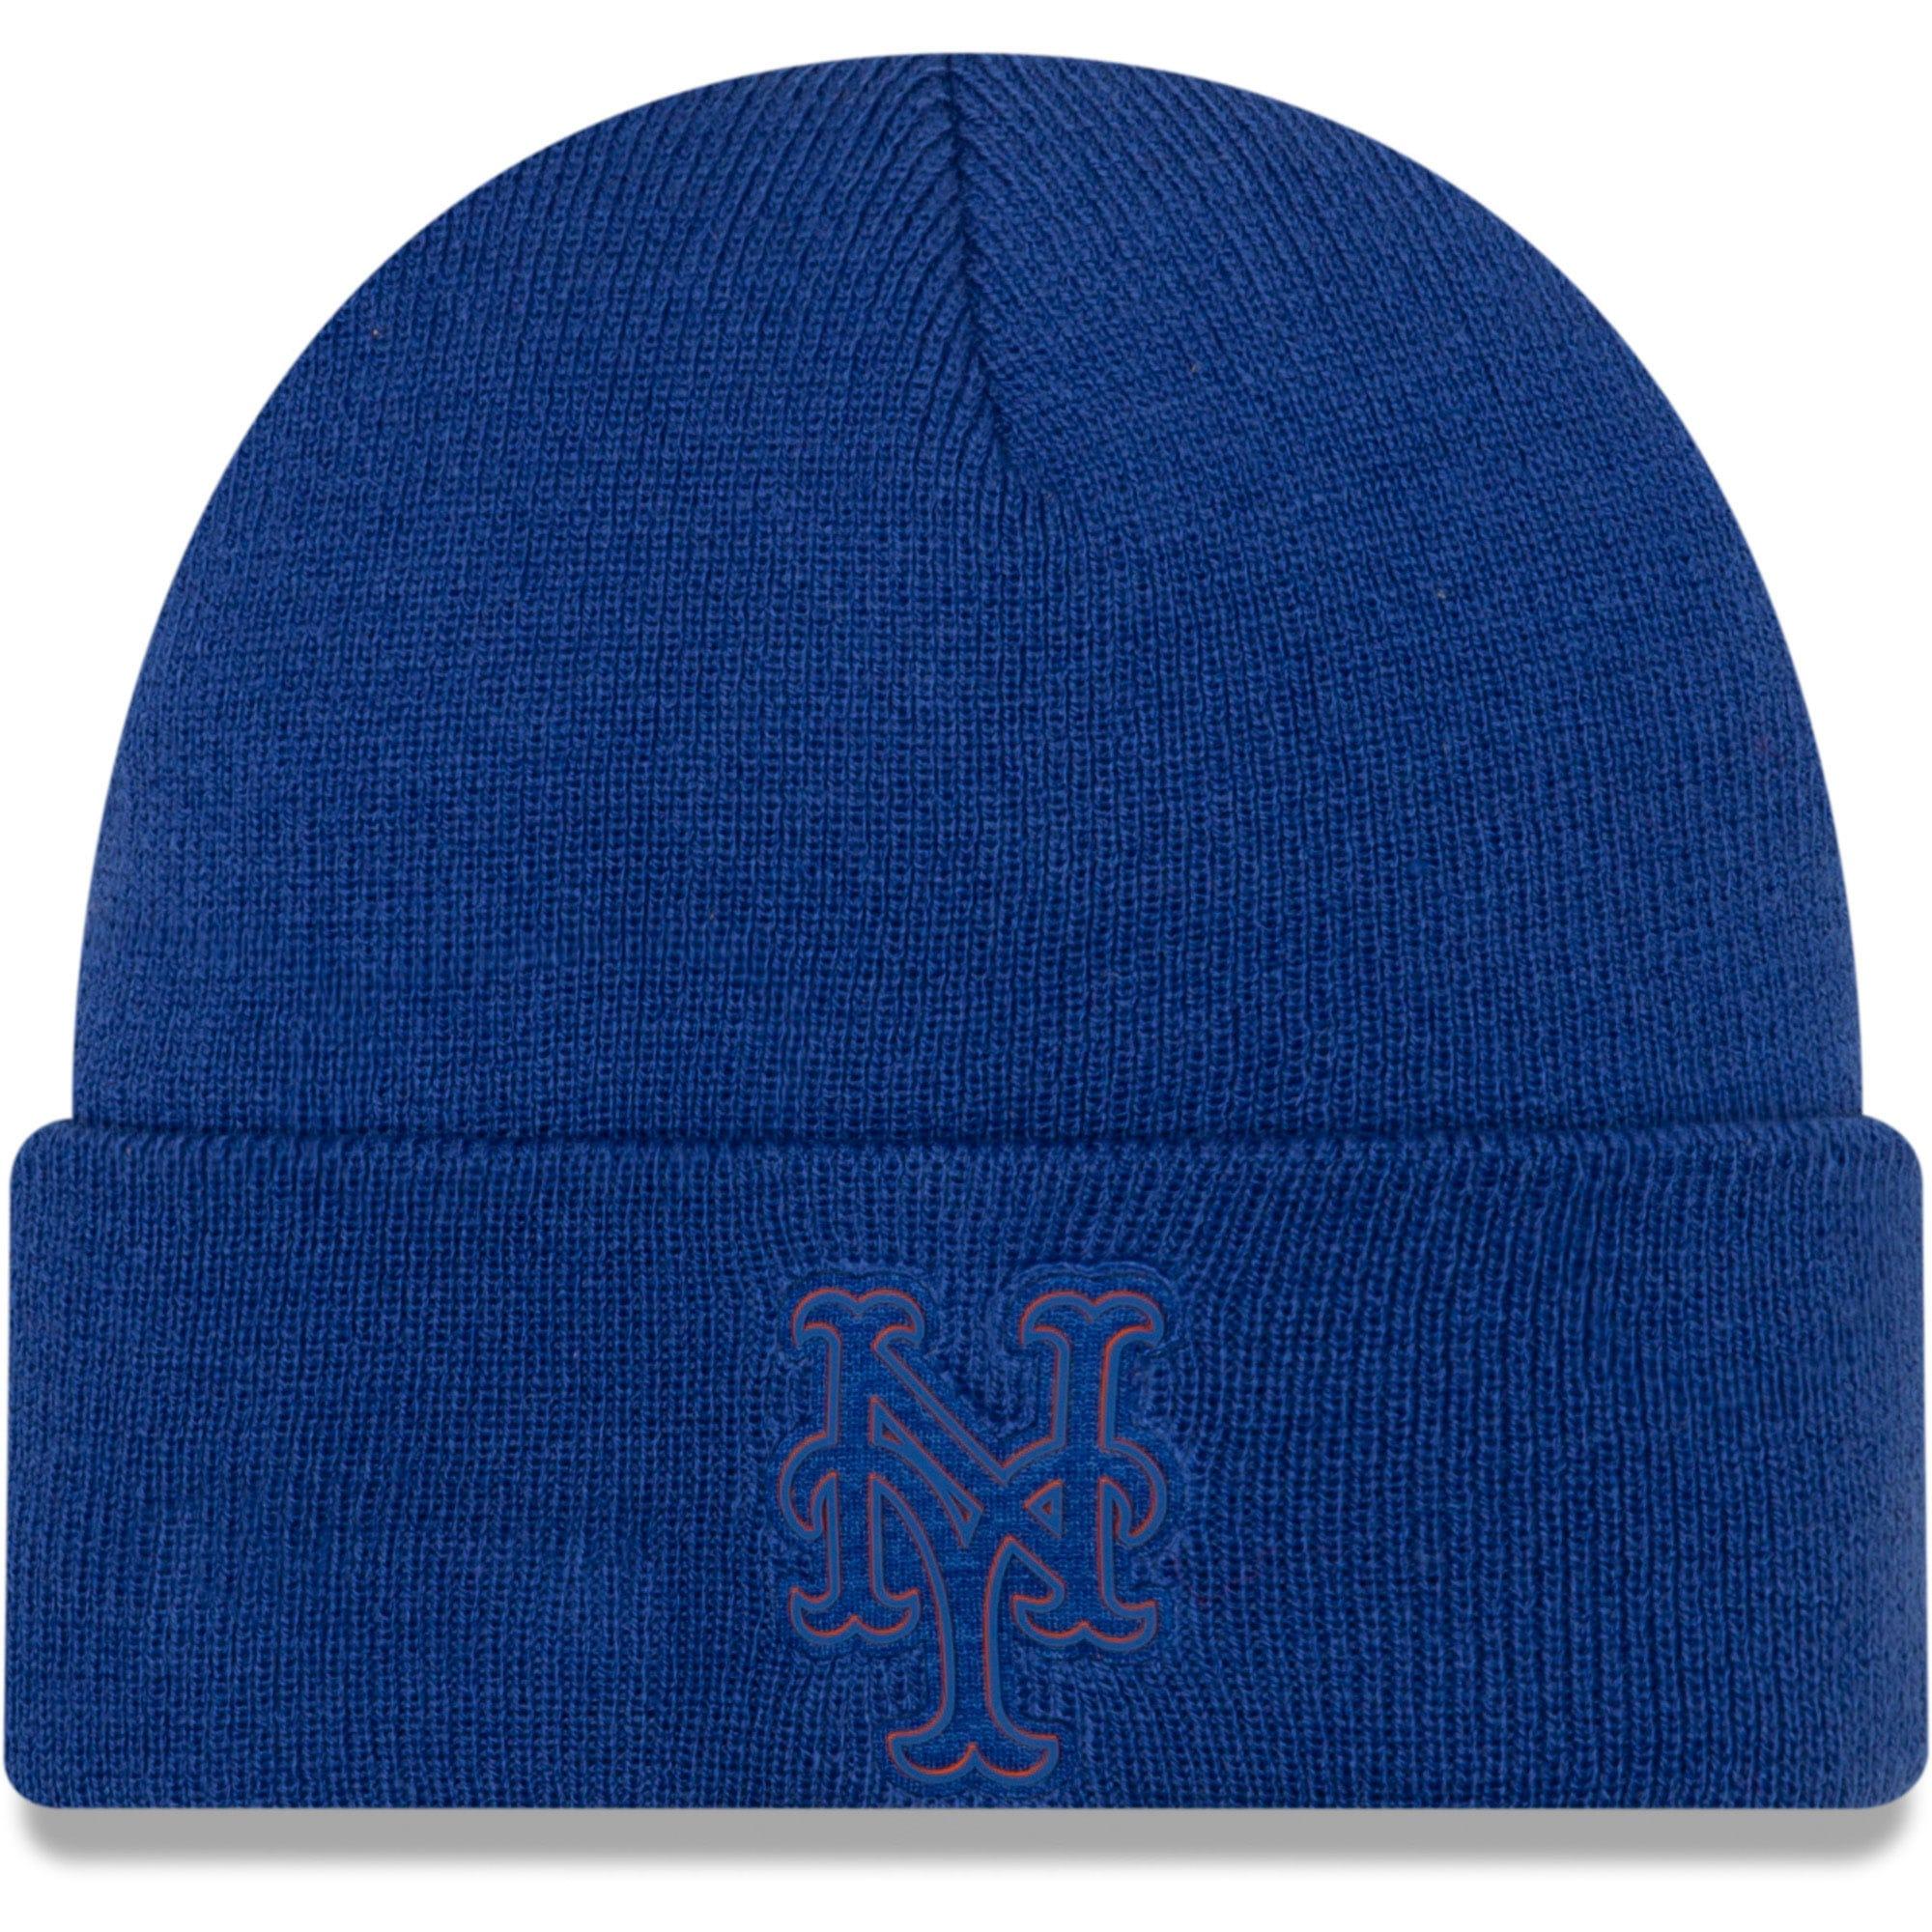 New York Mets New Era Vivid Cuffed Knit Hat - Royal